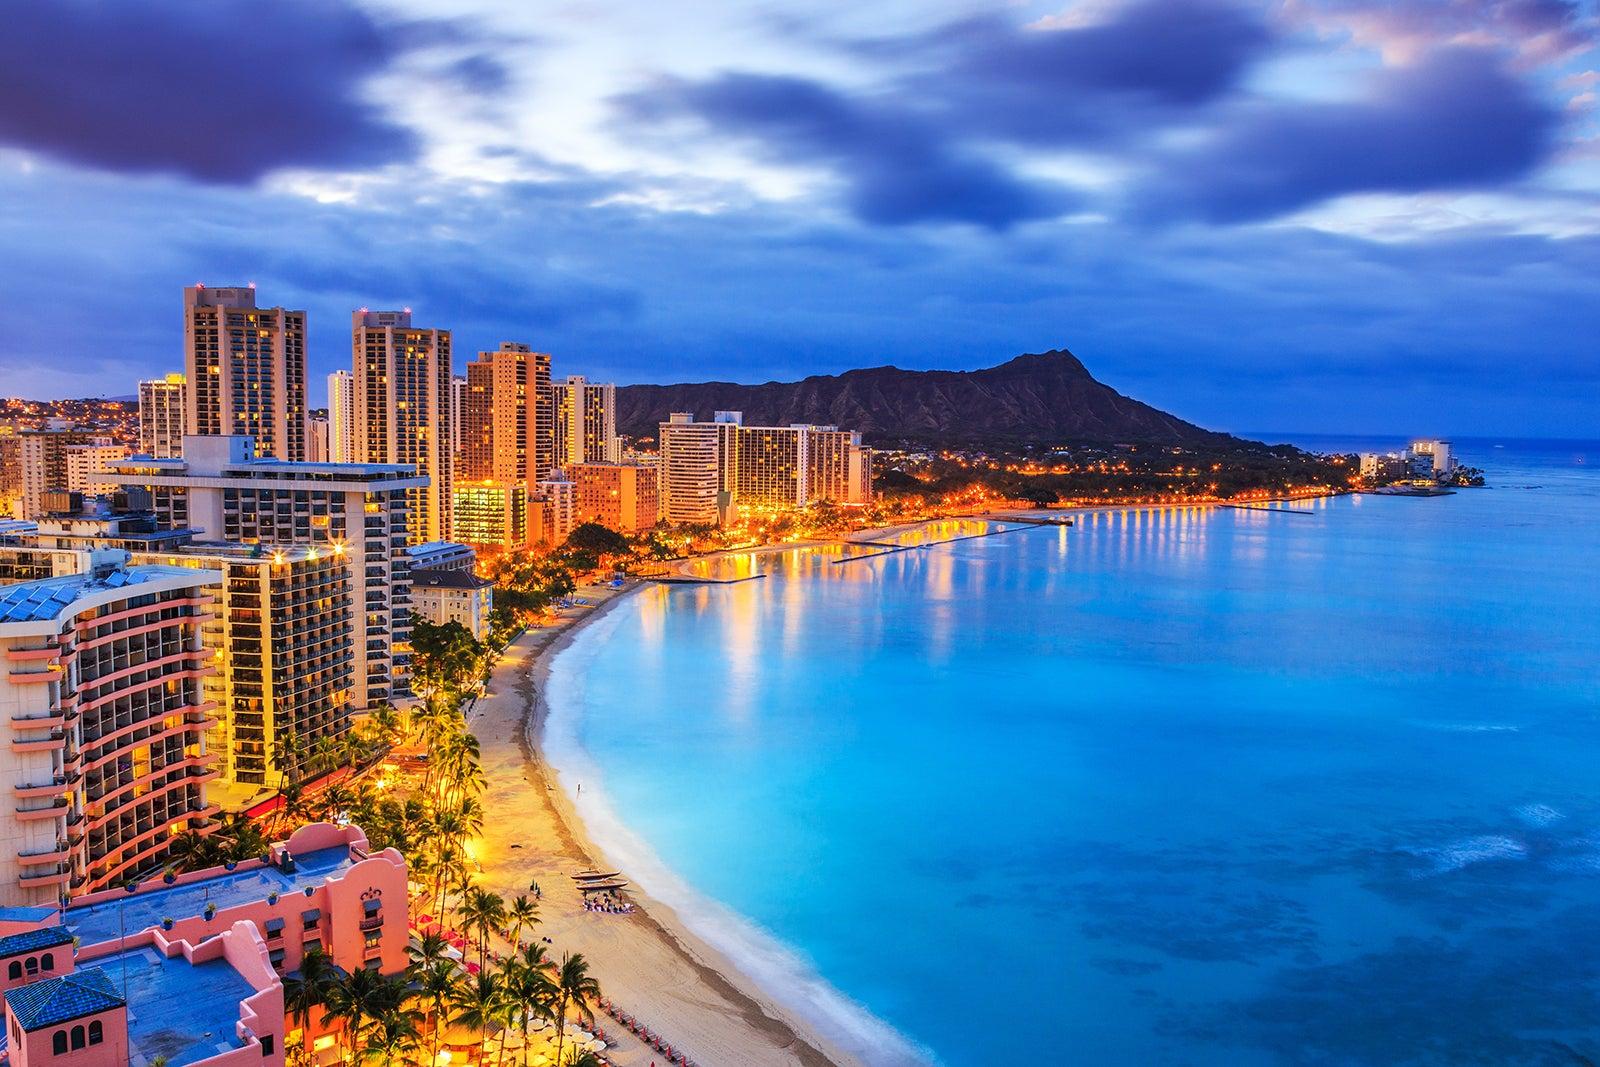 Waikiki Beach The World Famous Beach Of Honolulu Go Guides